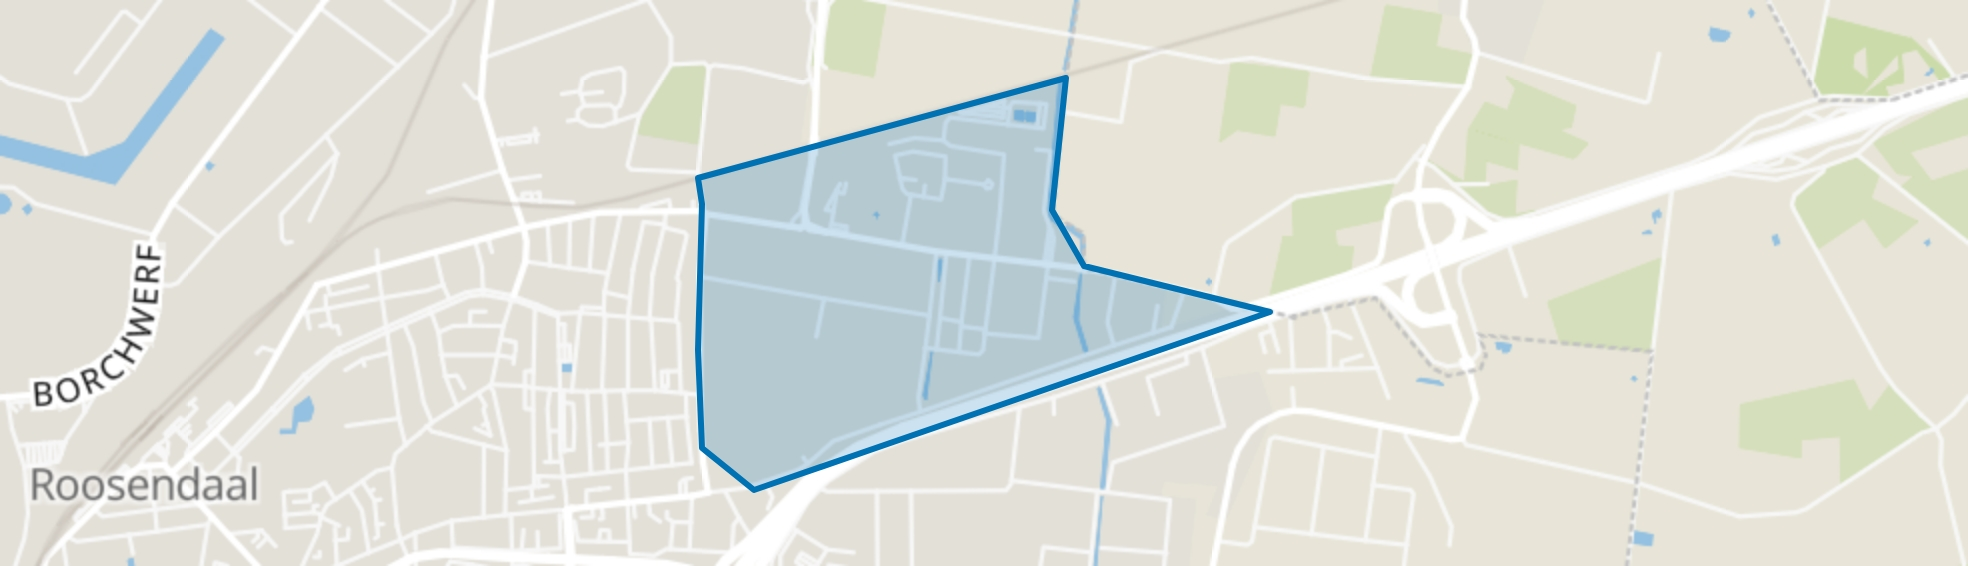 Majoppeveld-Noord, Roosendaal map